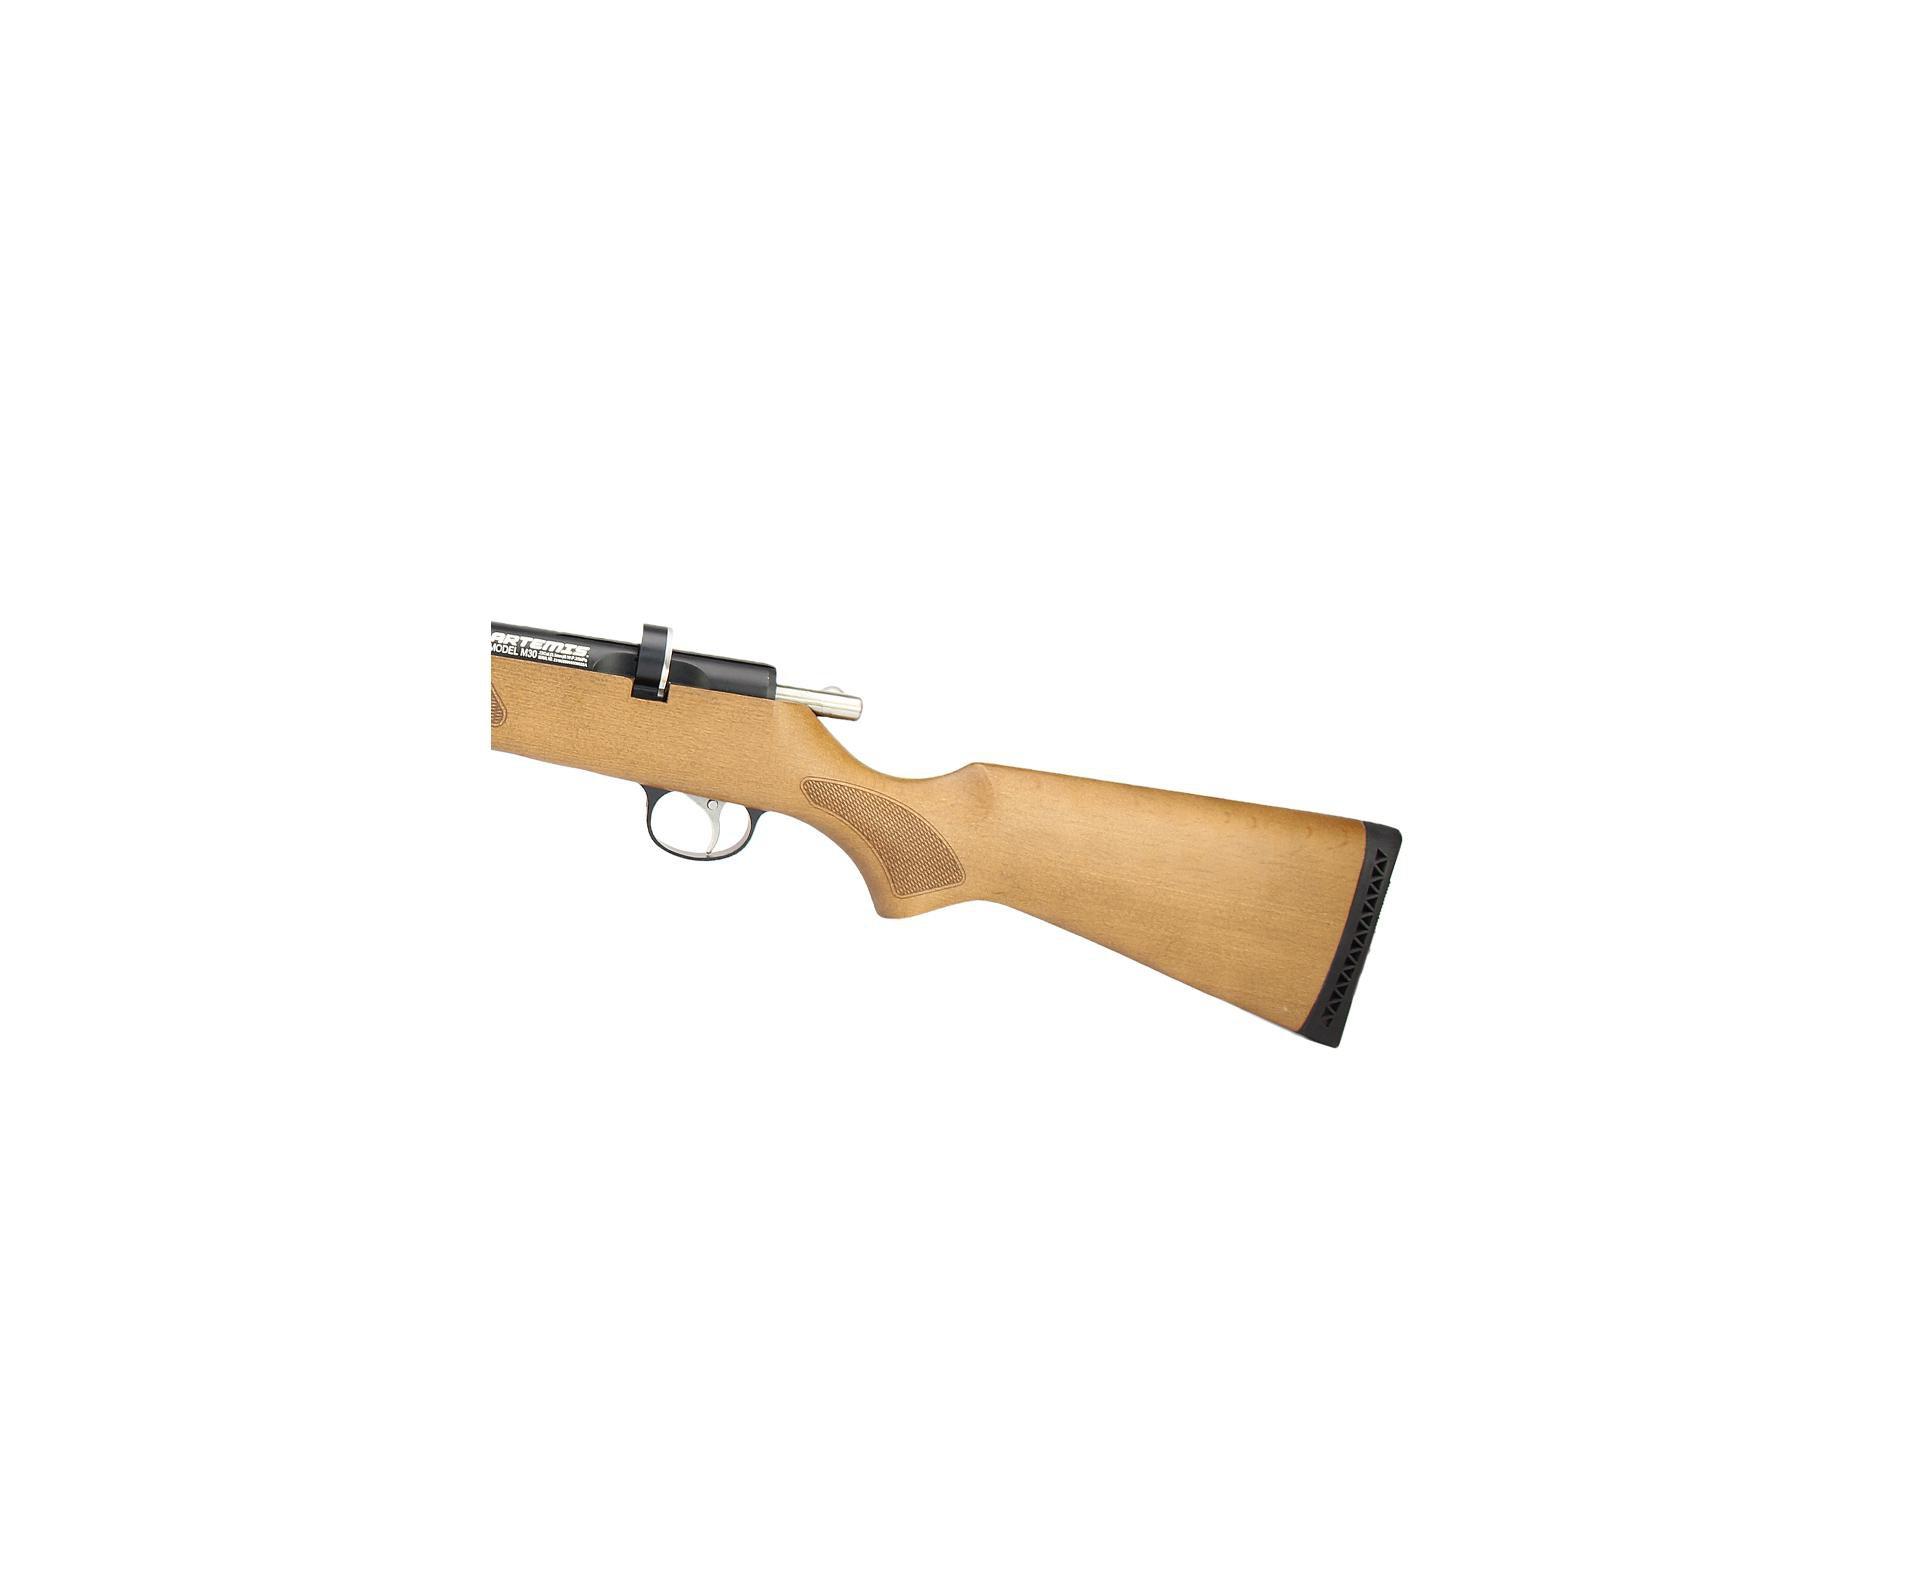 Carabina De Pressão Pcp Artemis M30 Multishot Madeira 5,5mm